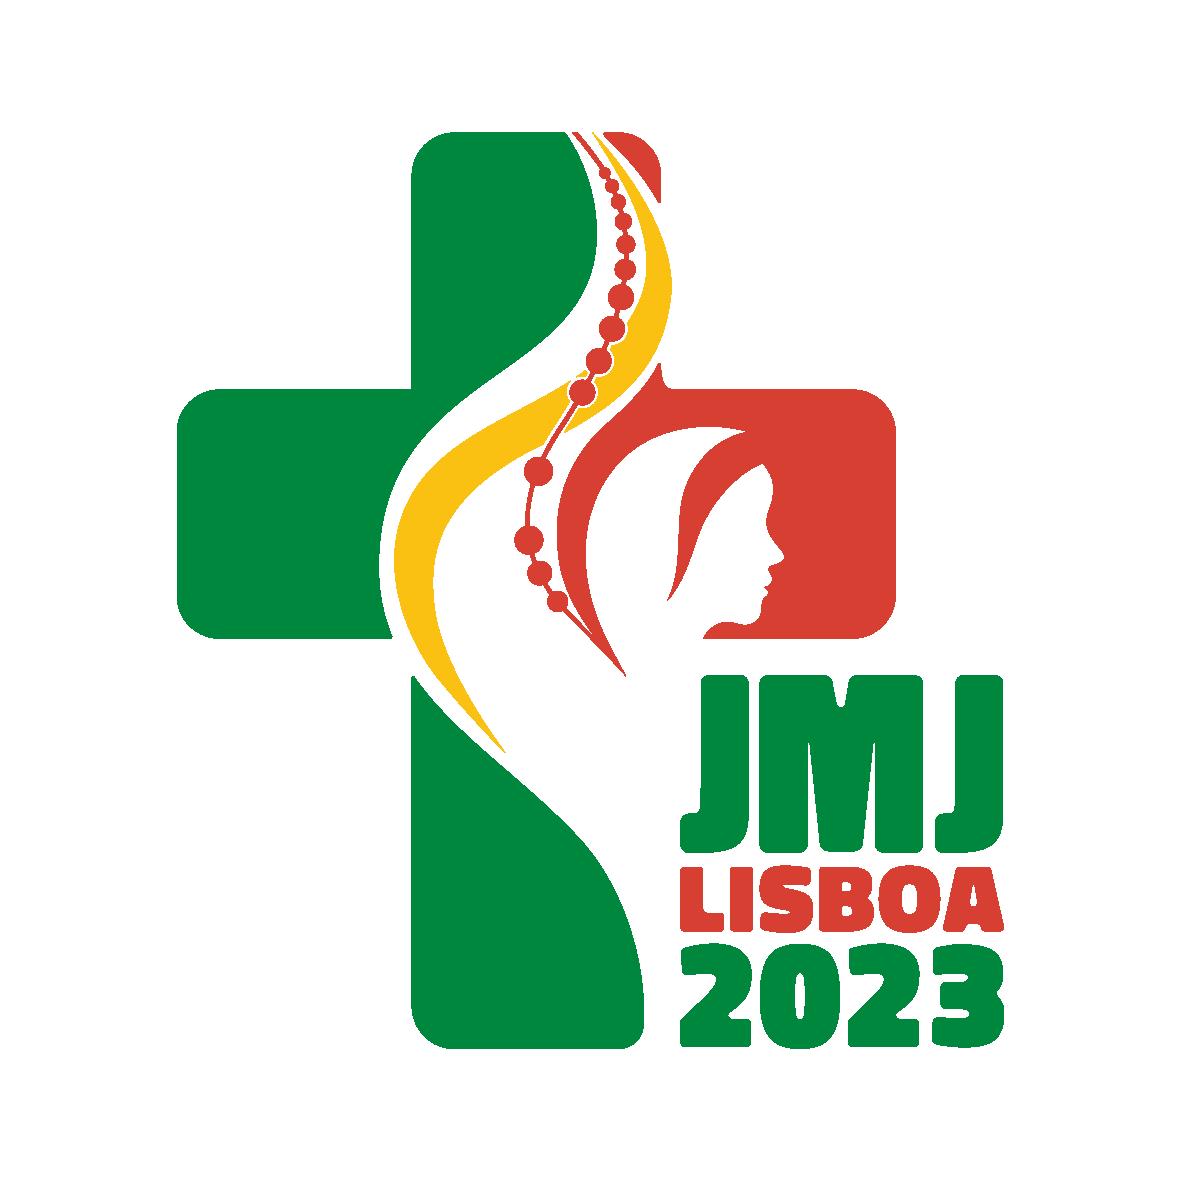 Presentan la imagen oficial de la JMJ Lisboa 2023 1